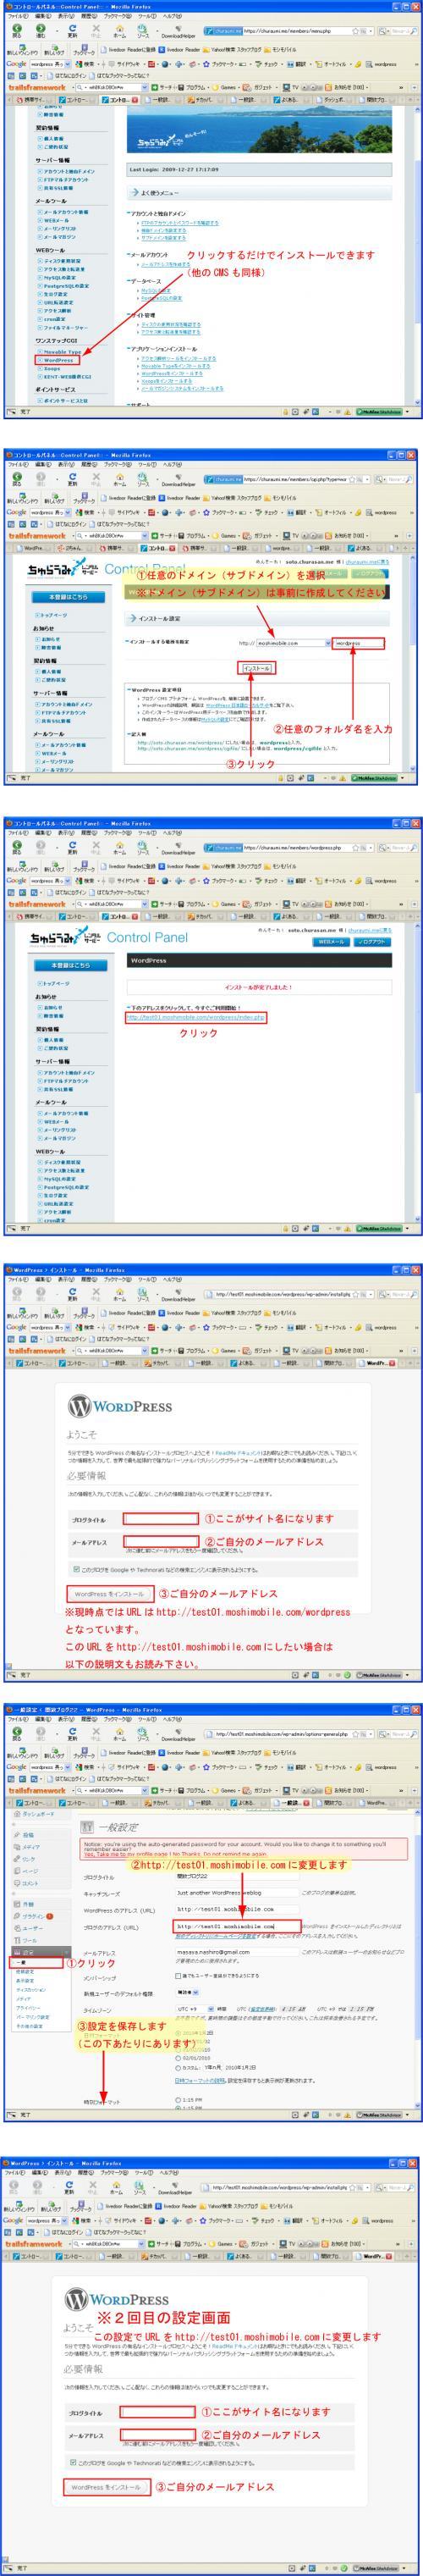 wordpress_install_convert_20100102142155.jpg